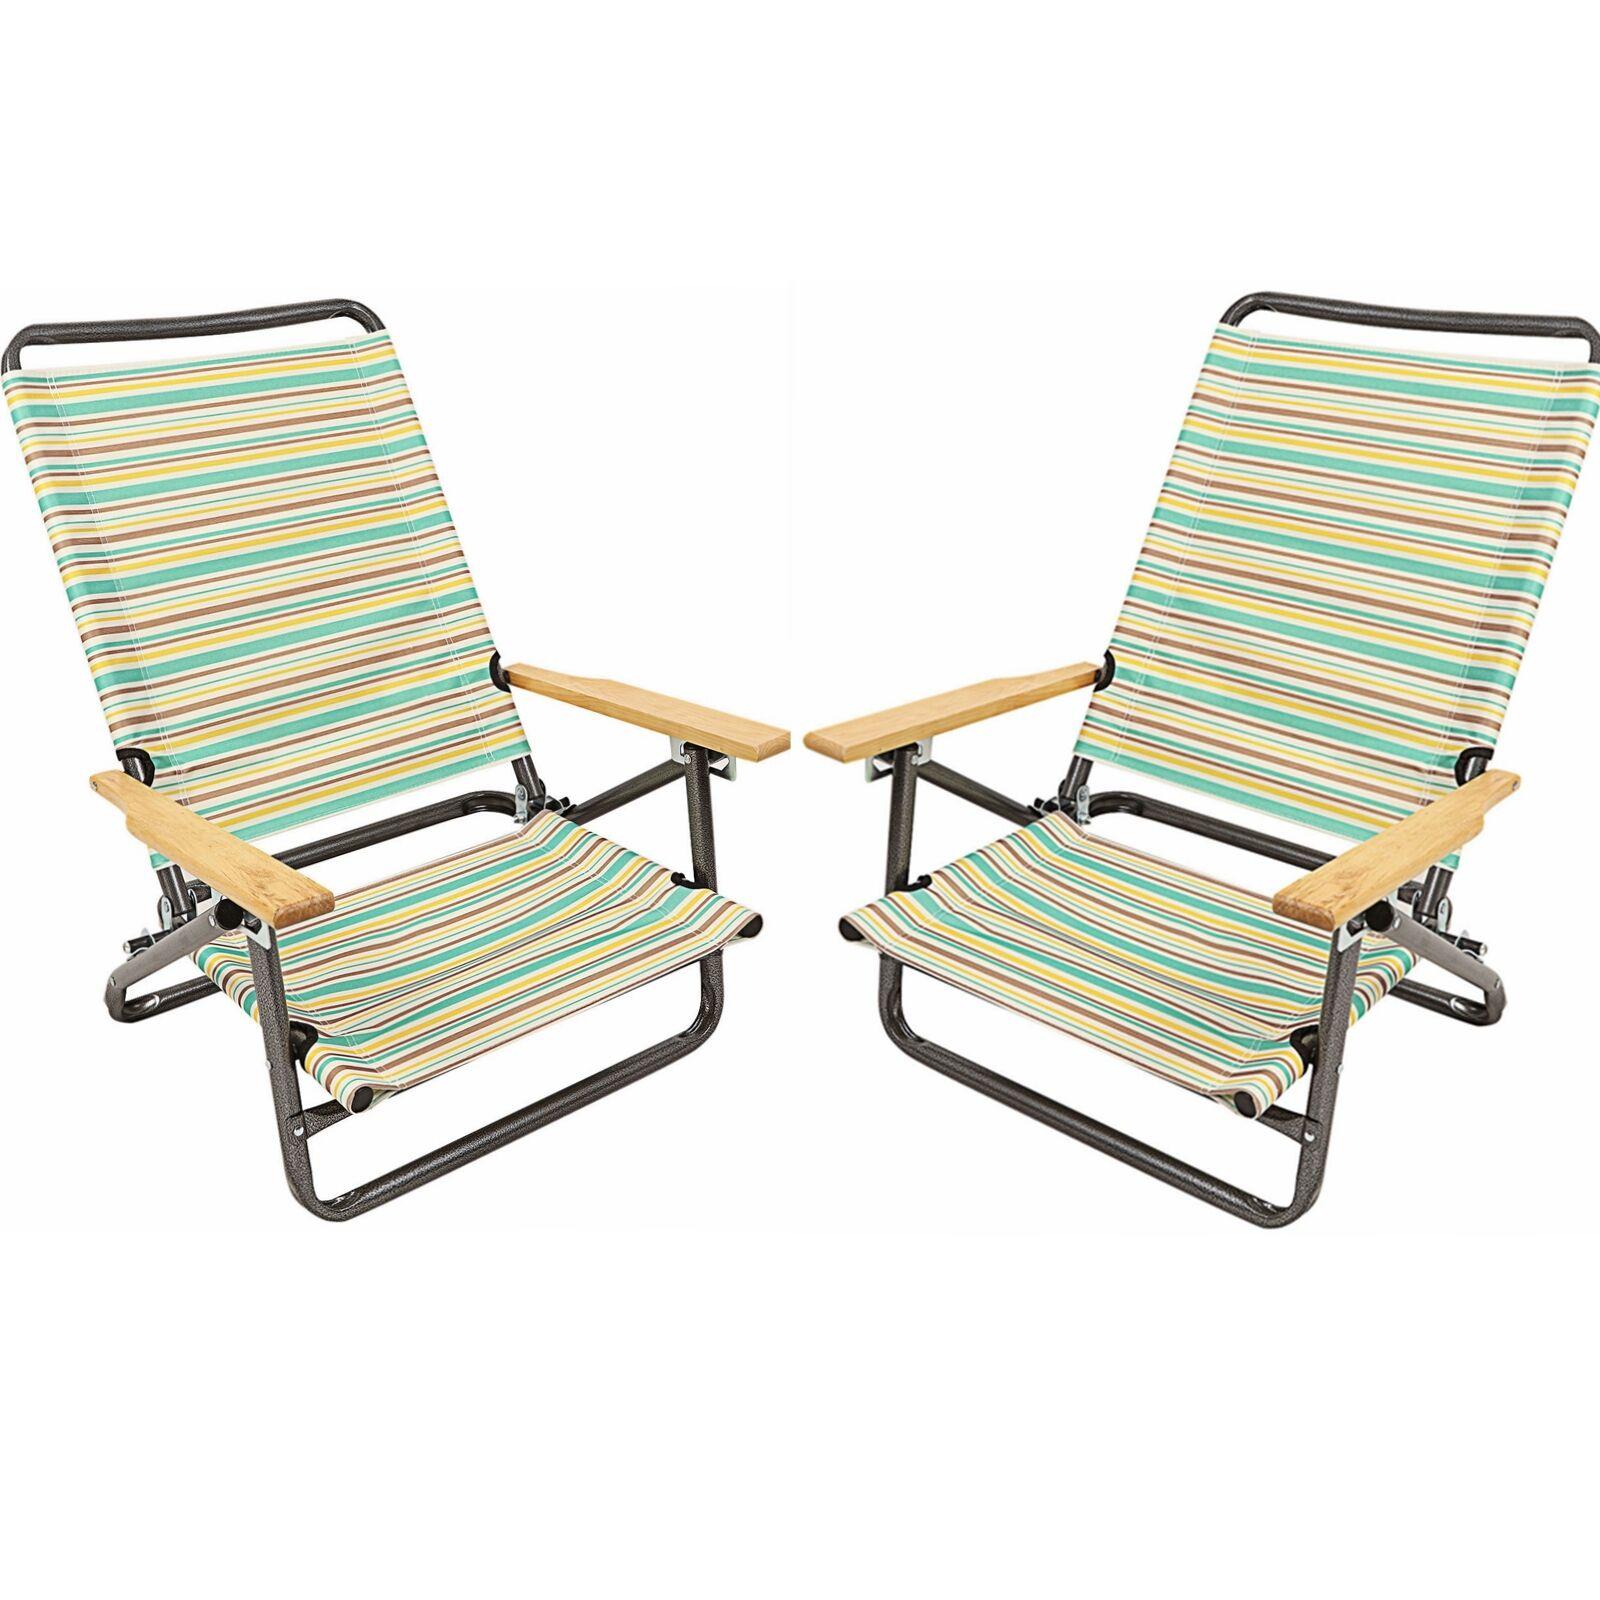 2 Folding Beach Chair Camping Chair Outdoor Arm Lightweight Portable 3-Position